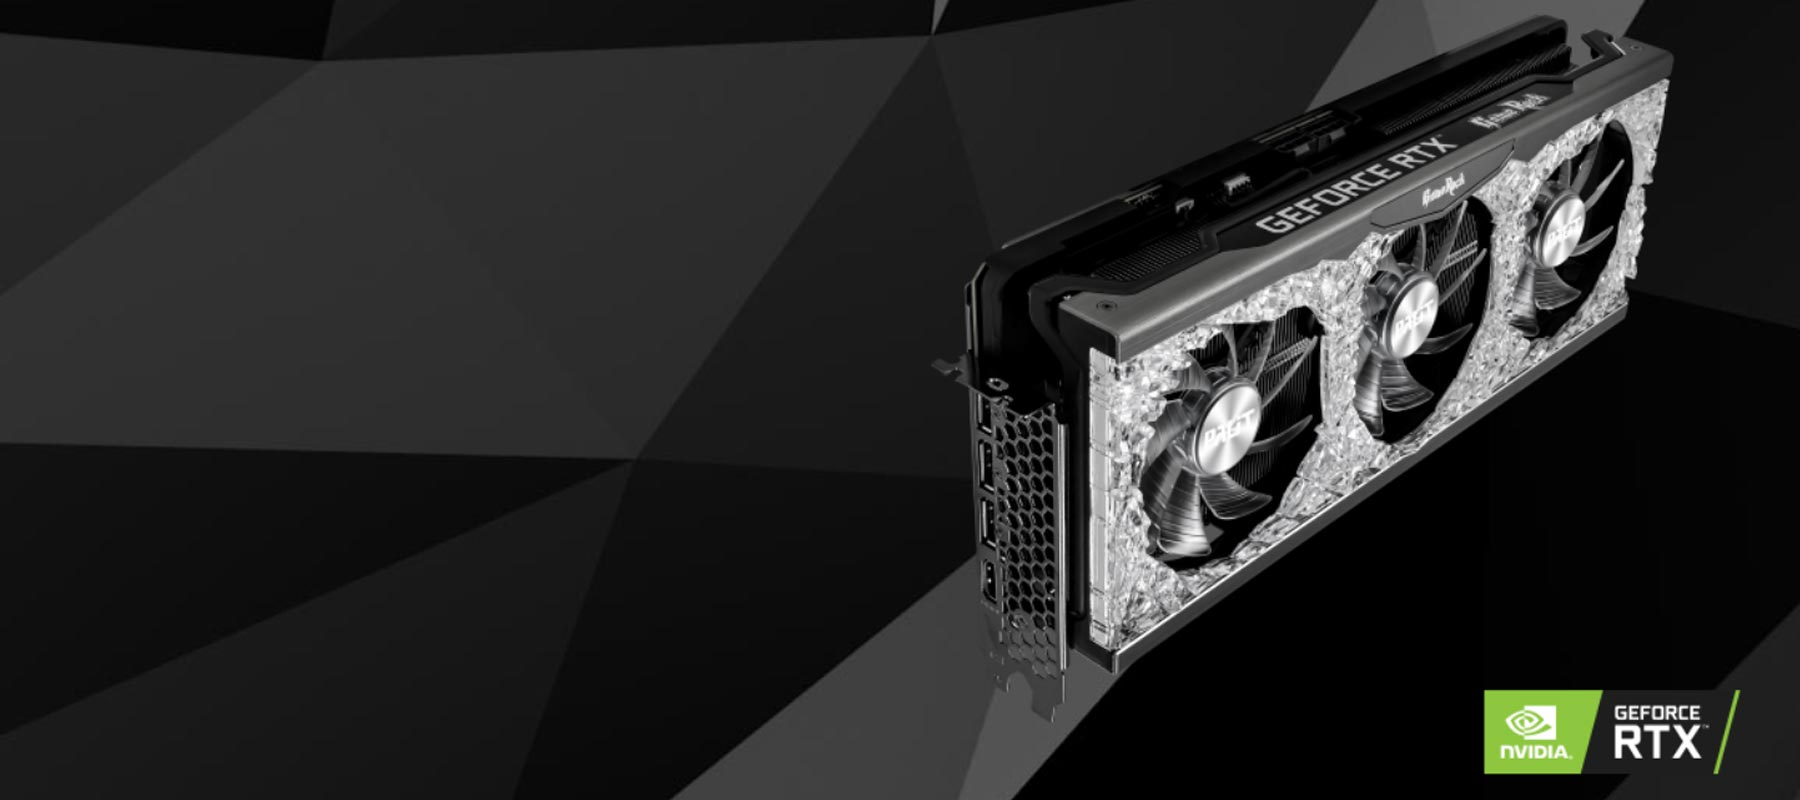 کارت گرافیک Palit GeForce RTX 3070 Ti GameRock OC